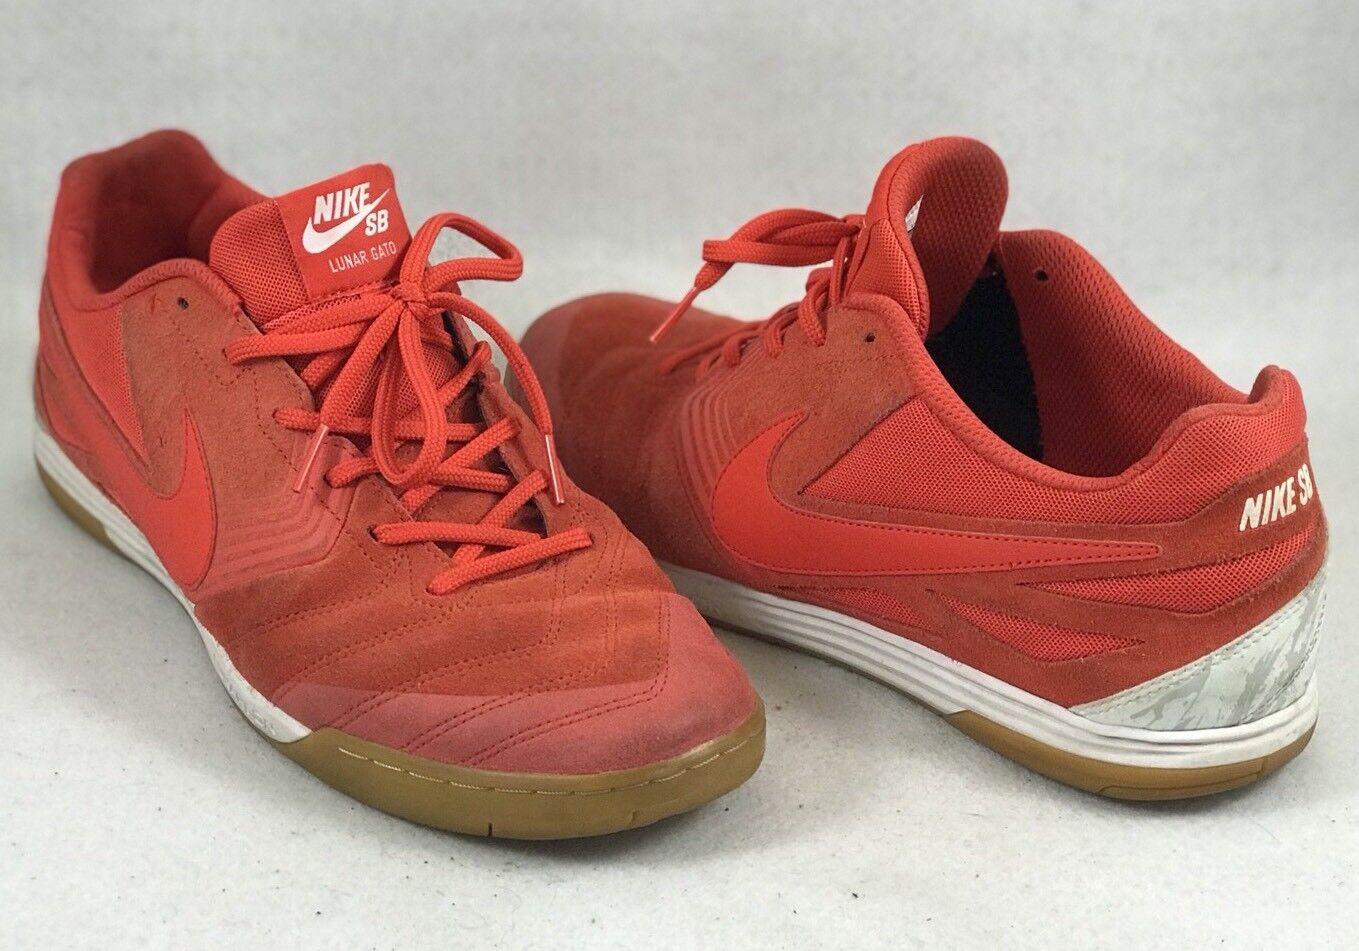 Nike SB GATO 631321 Limited 'Strike & Destroy' Mens Size 12 EUC - 1289